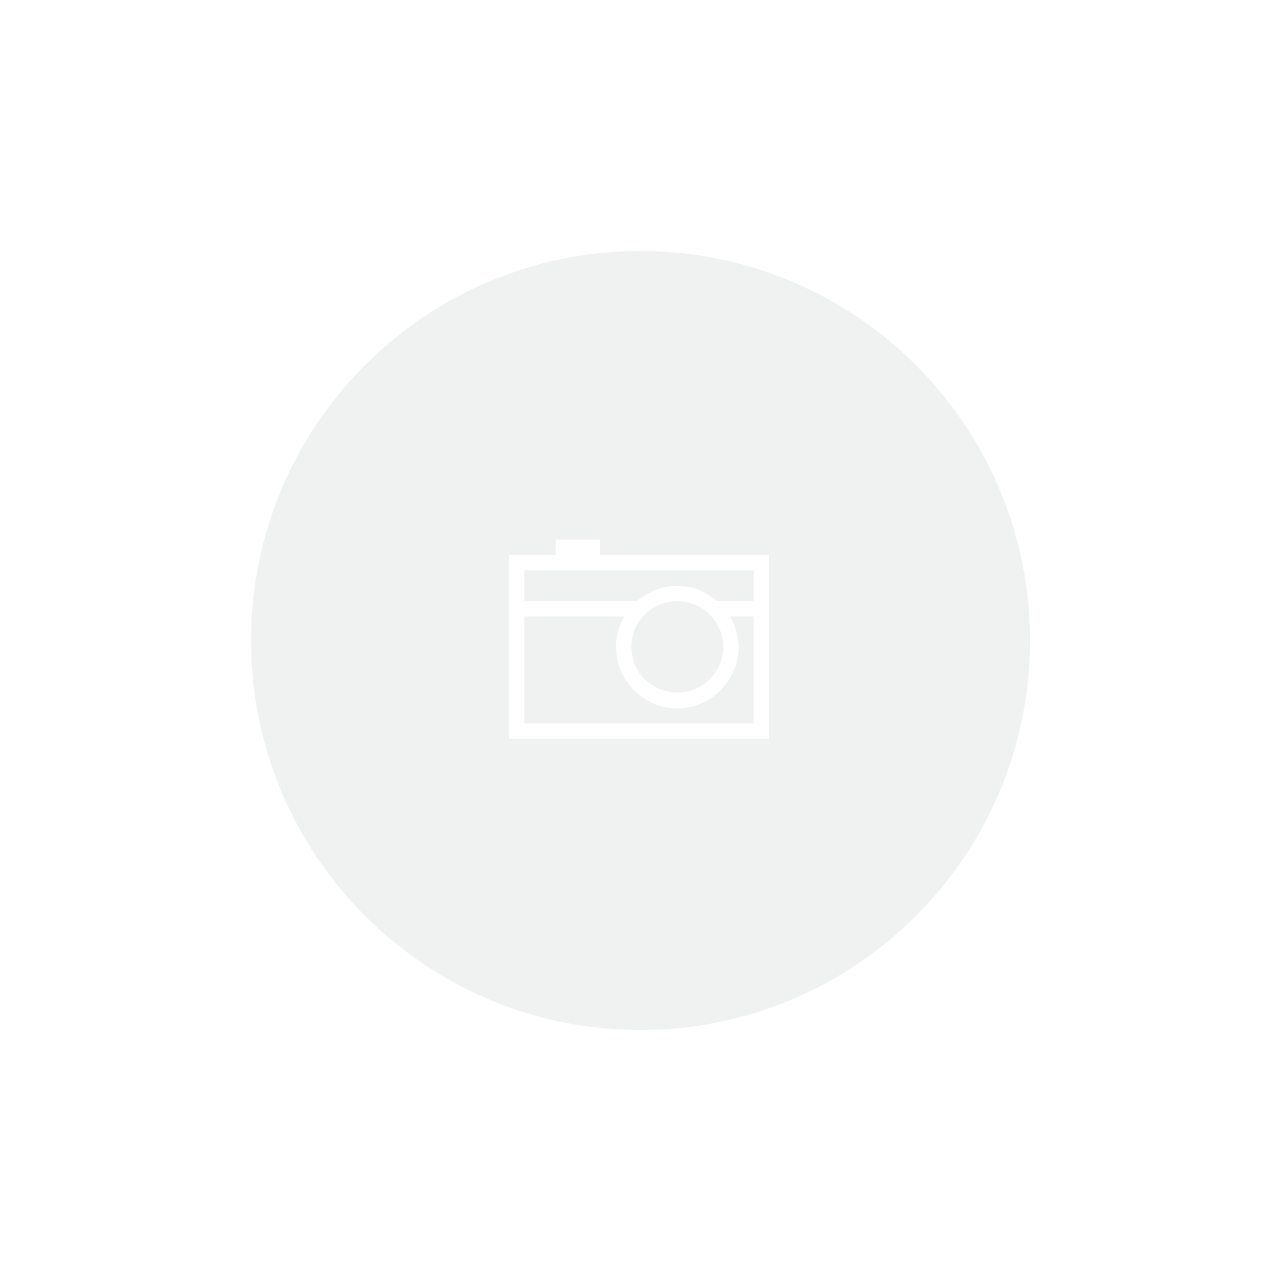 Papel Artesanal Indiano - Ref. 90